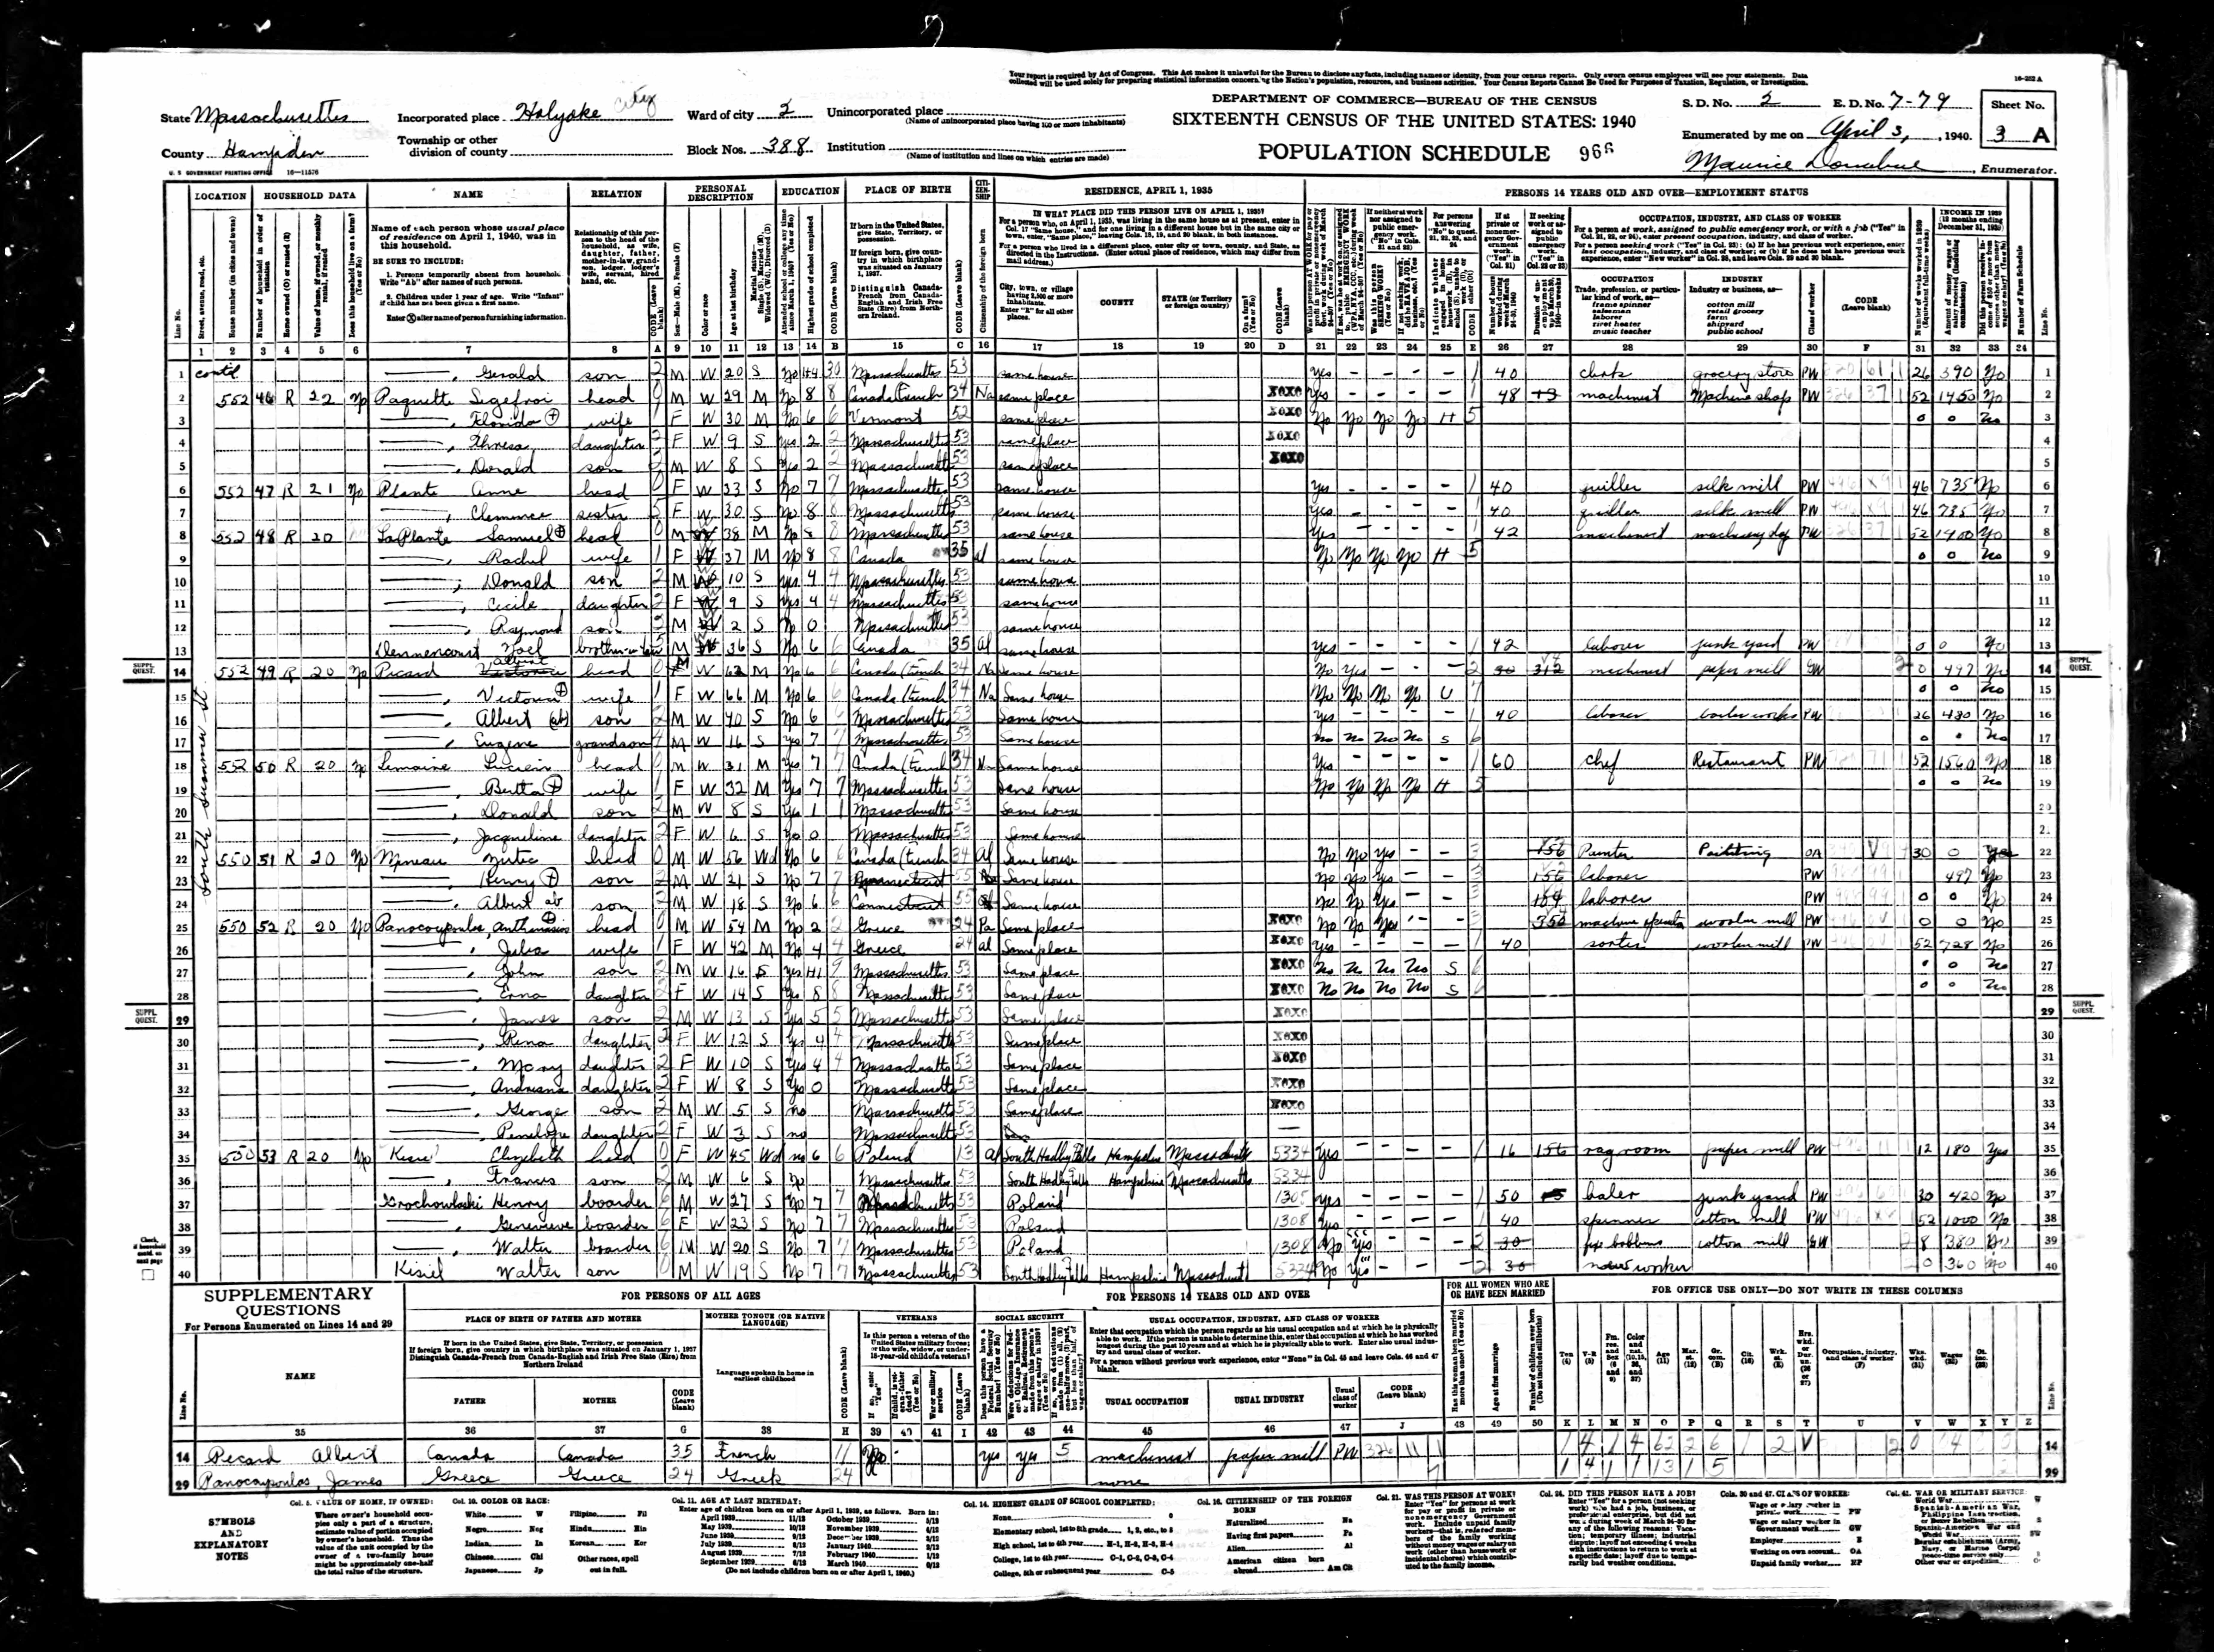 Markandjoanie genealogy grochowalski 18 jun 2010 holyoke massachusetts usa obituary emigration bef 1942 military wwii enlisted 4 sep 1942 springfield massachusetts aiddatafo Image collections